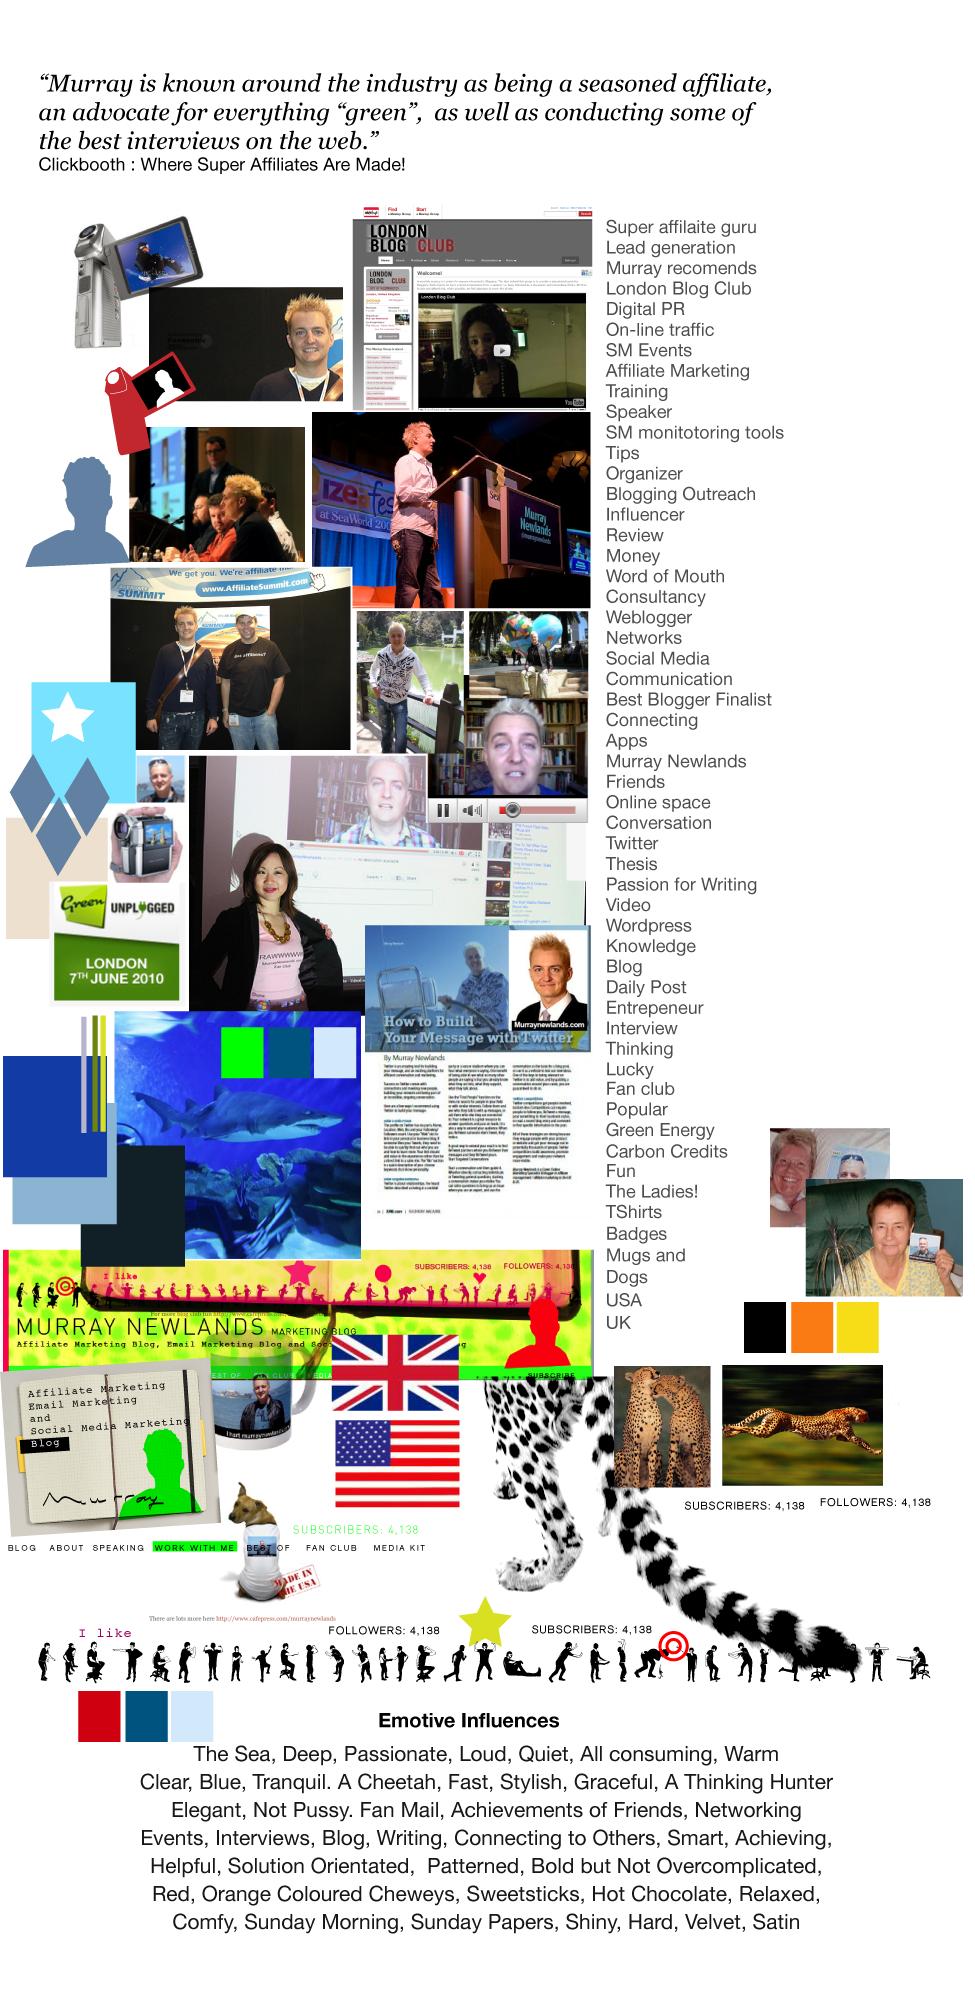 Redesign #4 Moodboard MurrayNewlands.com by Katja Garrood of Brand Watch